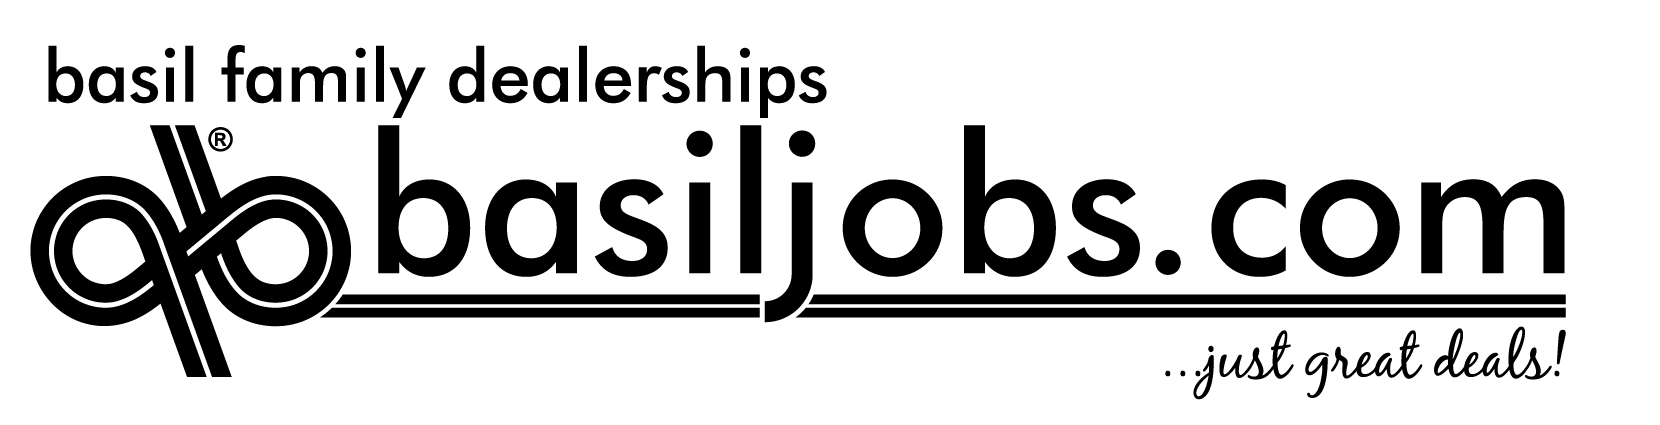 basiljobs-black